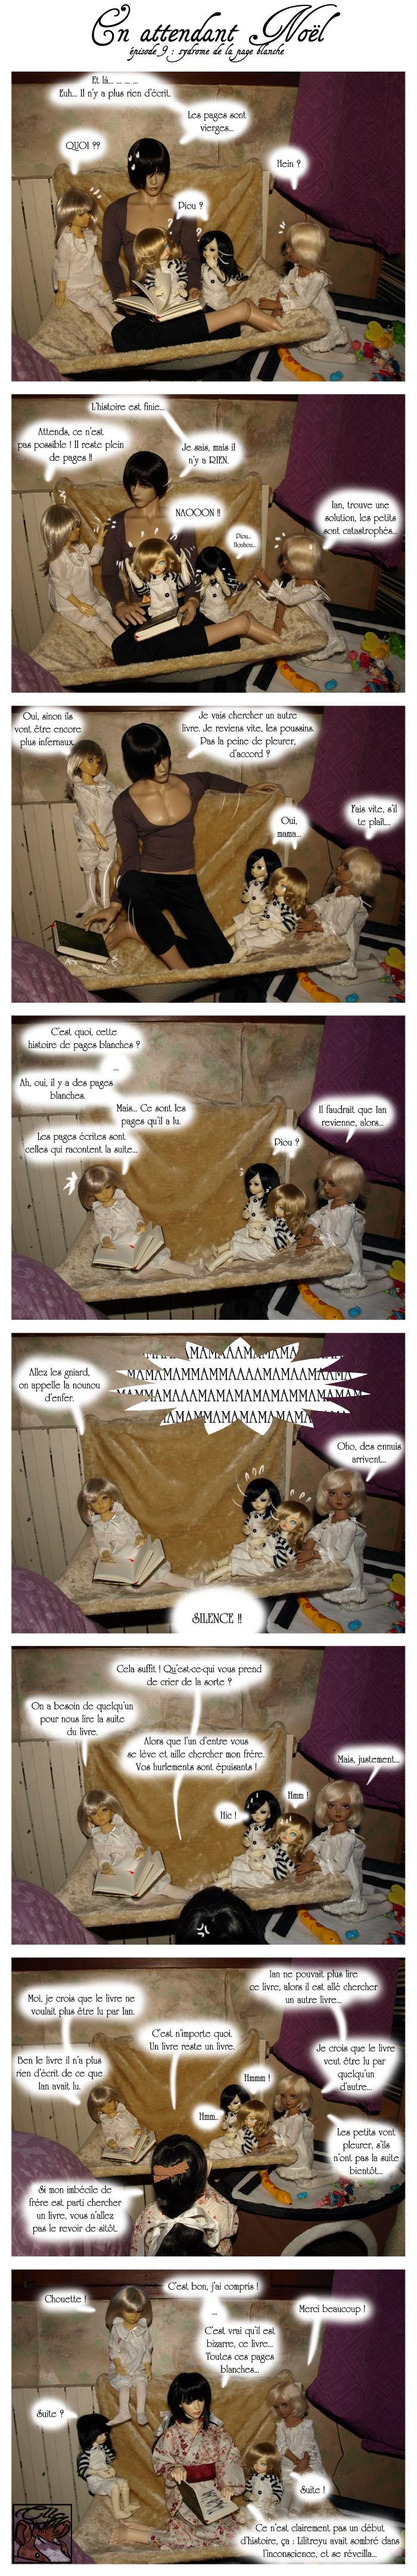 [Heika's 3] Pauvre Noël JOYEUX NOEL - Page 2 Blanck_syndrom_by_monsieur_cheval-d899qw4